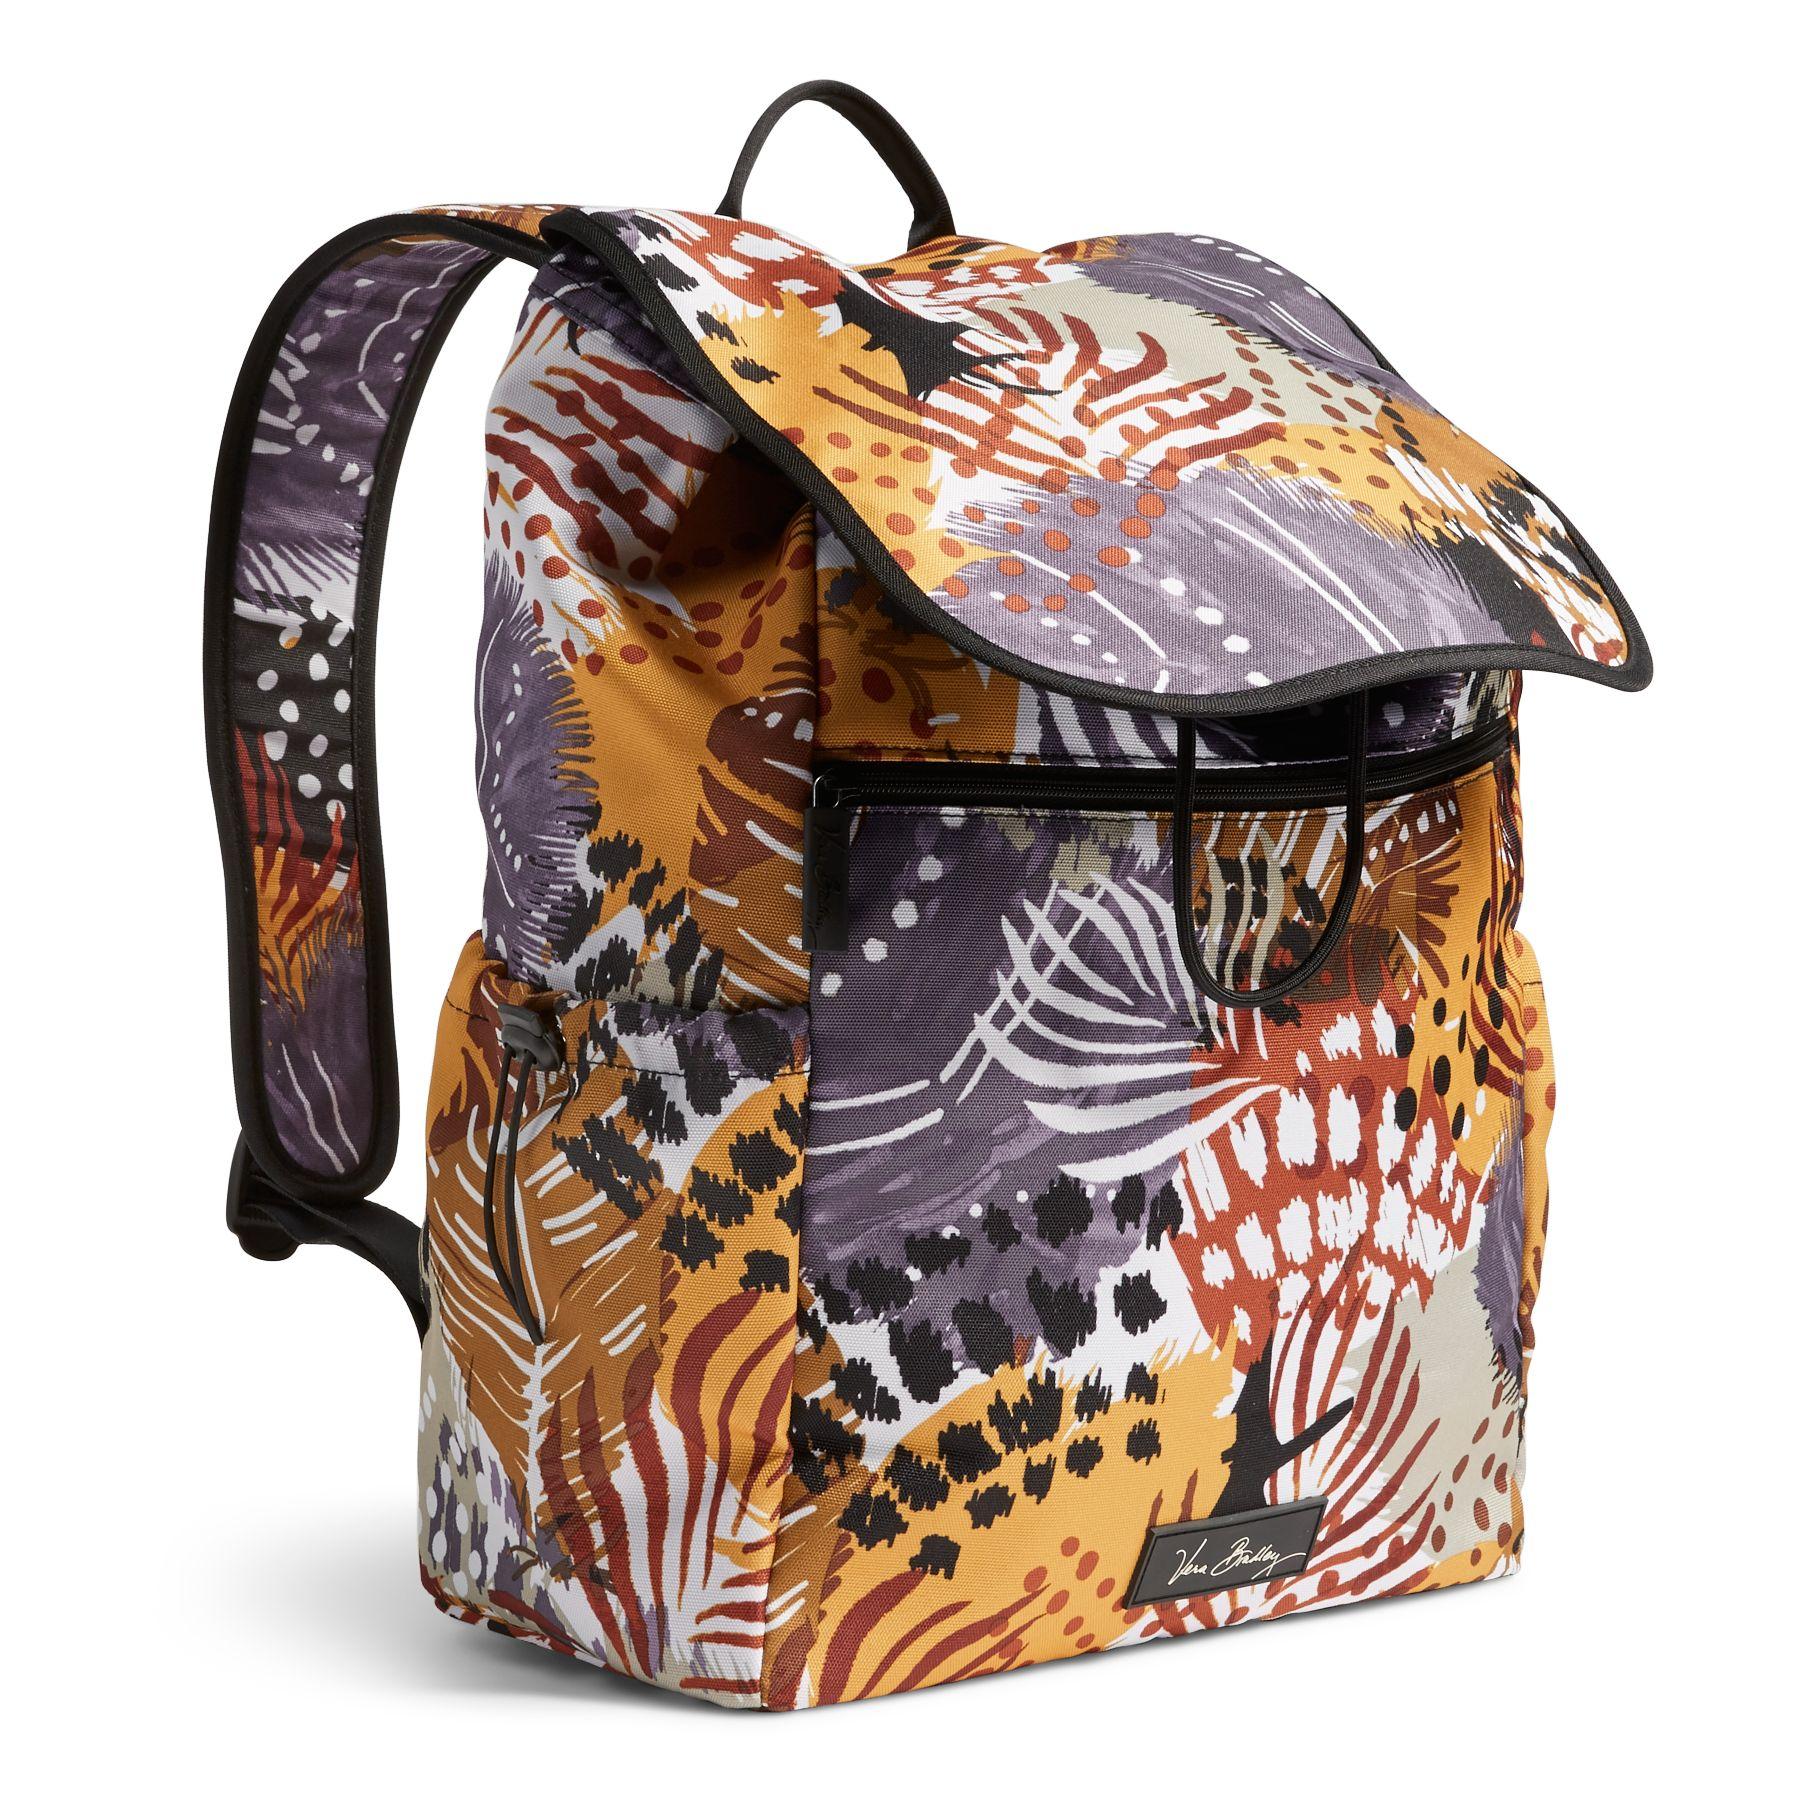 Vera Bradley Lighten Up Drawstring Backpack Bag